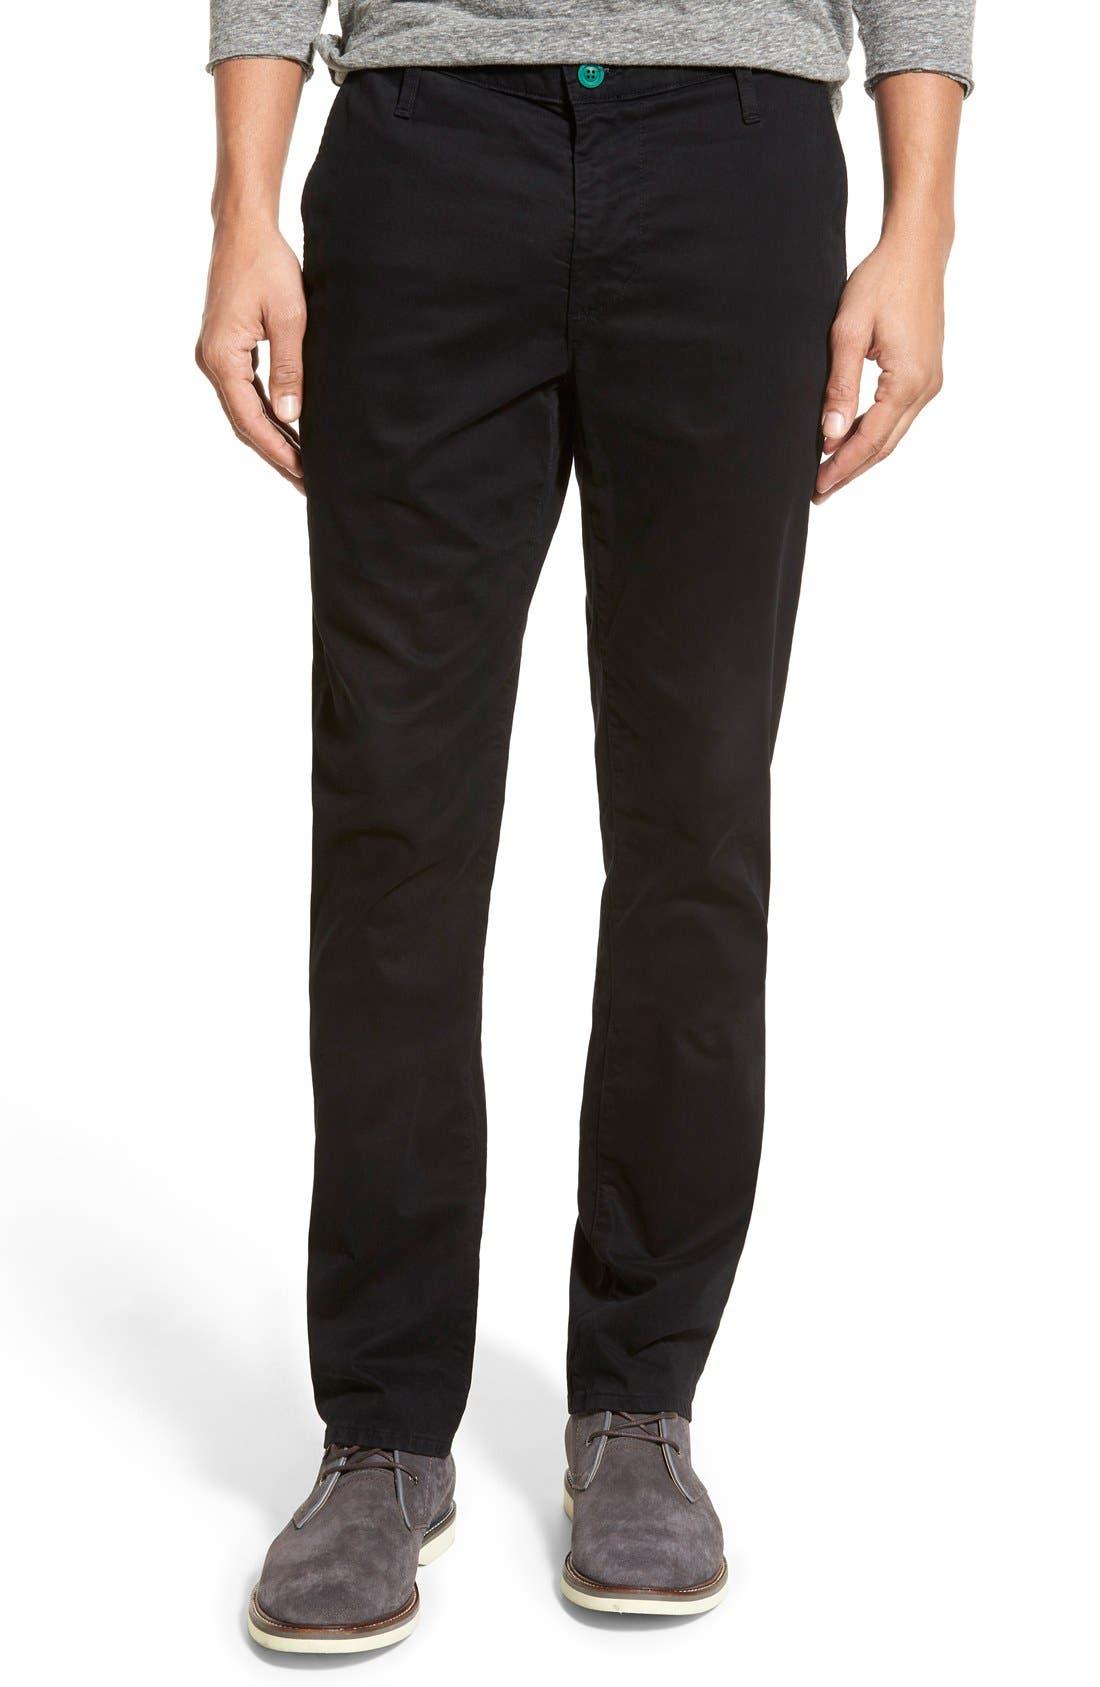 Alternate Image 1 Selected - AG Green Label 'Graduate' Slim Straight Leg Golf Pants